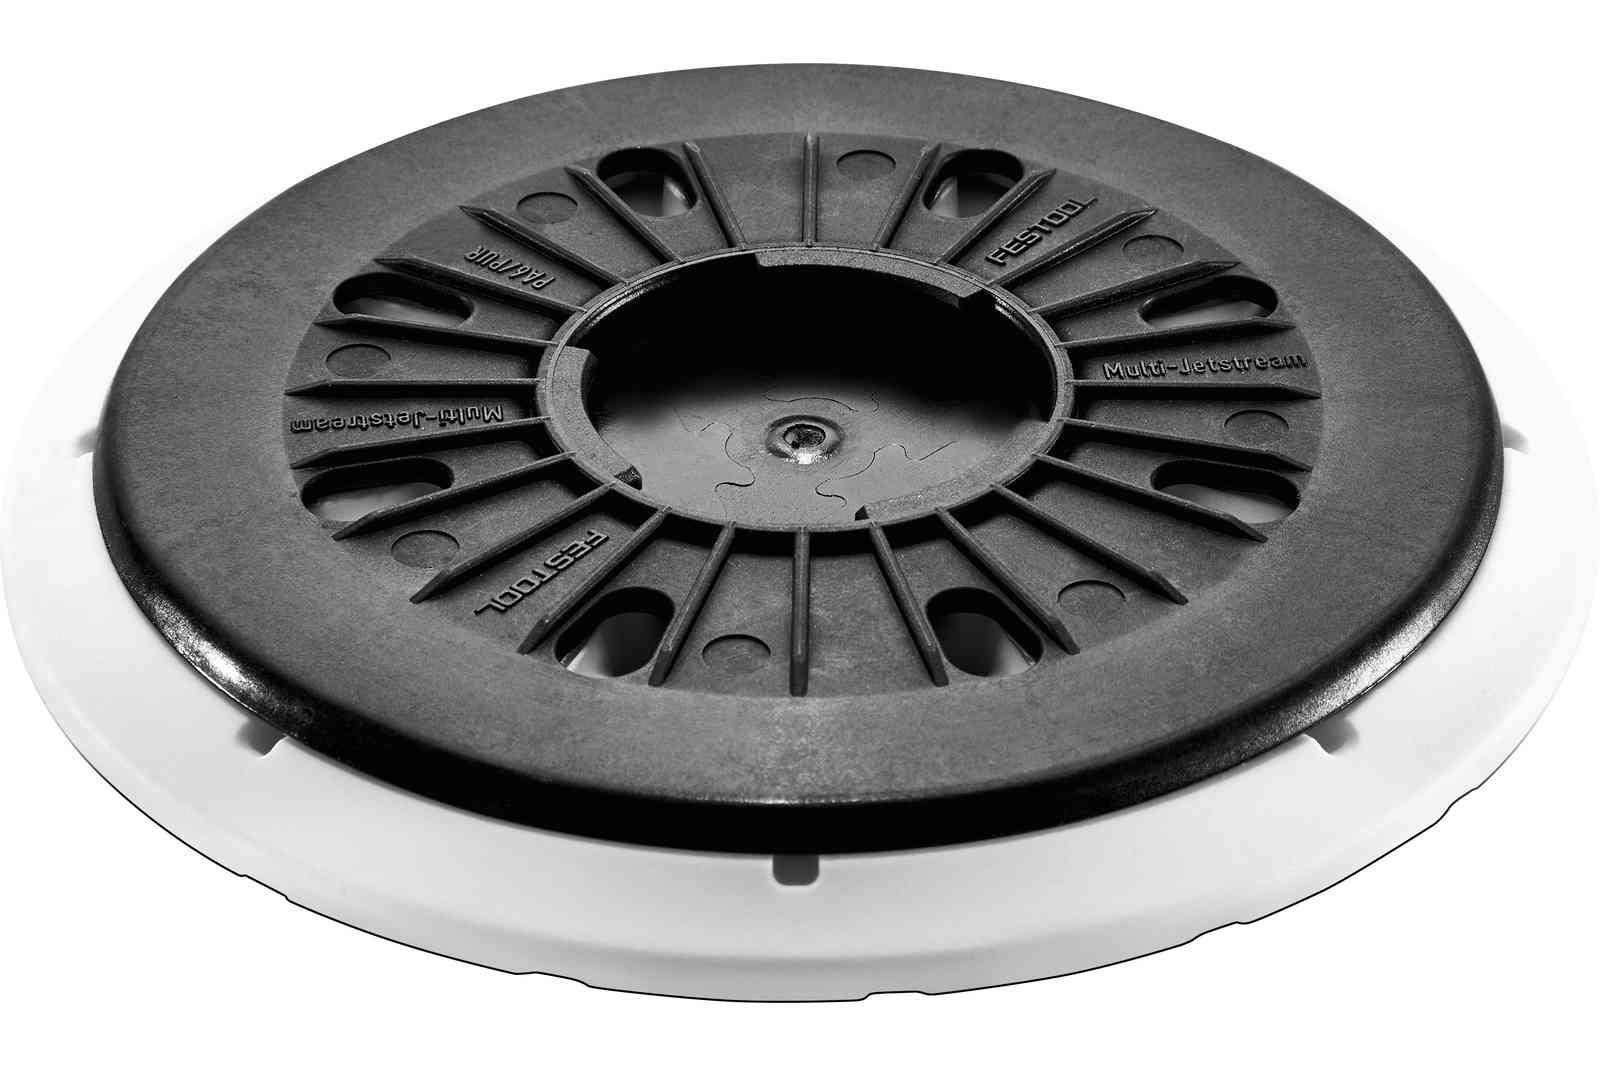 Festool 202461 RO 150 Soft Sanding Pad